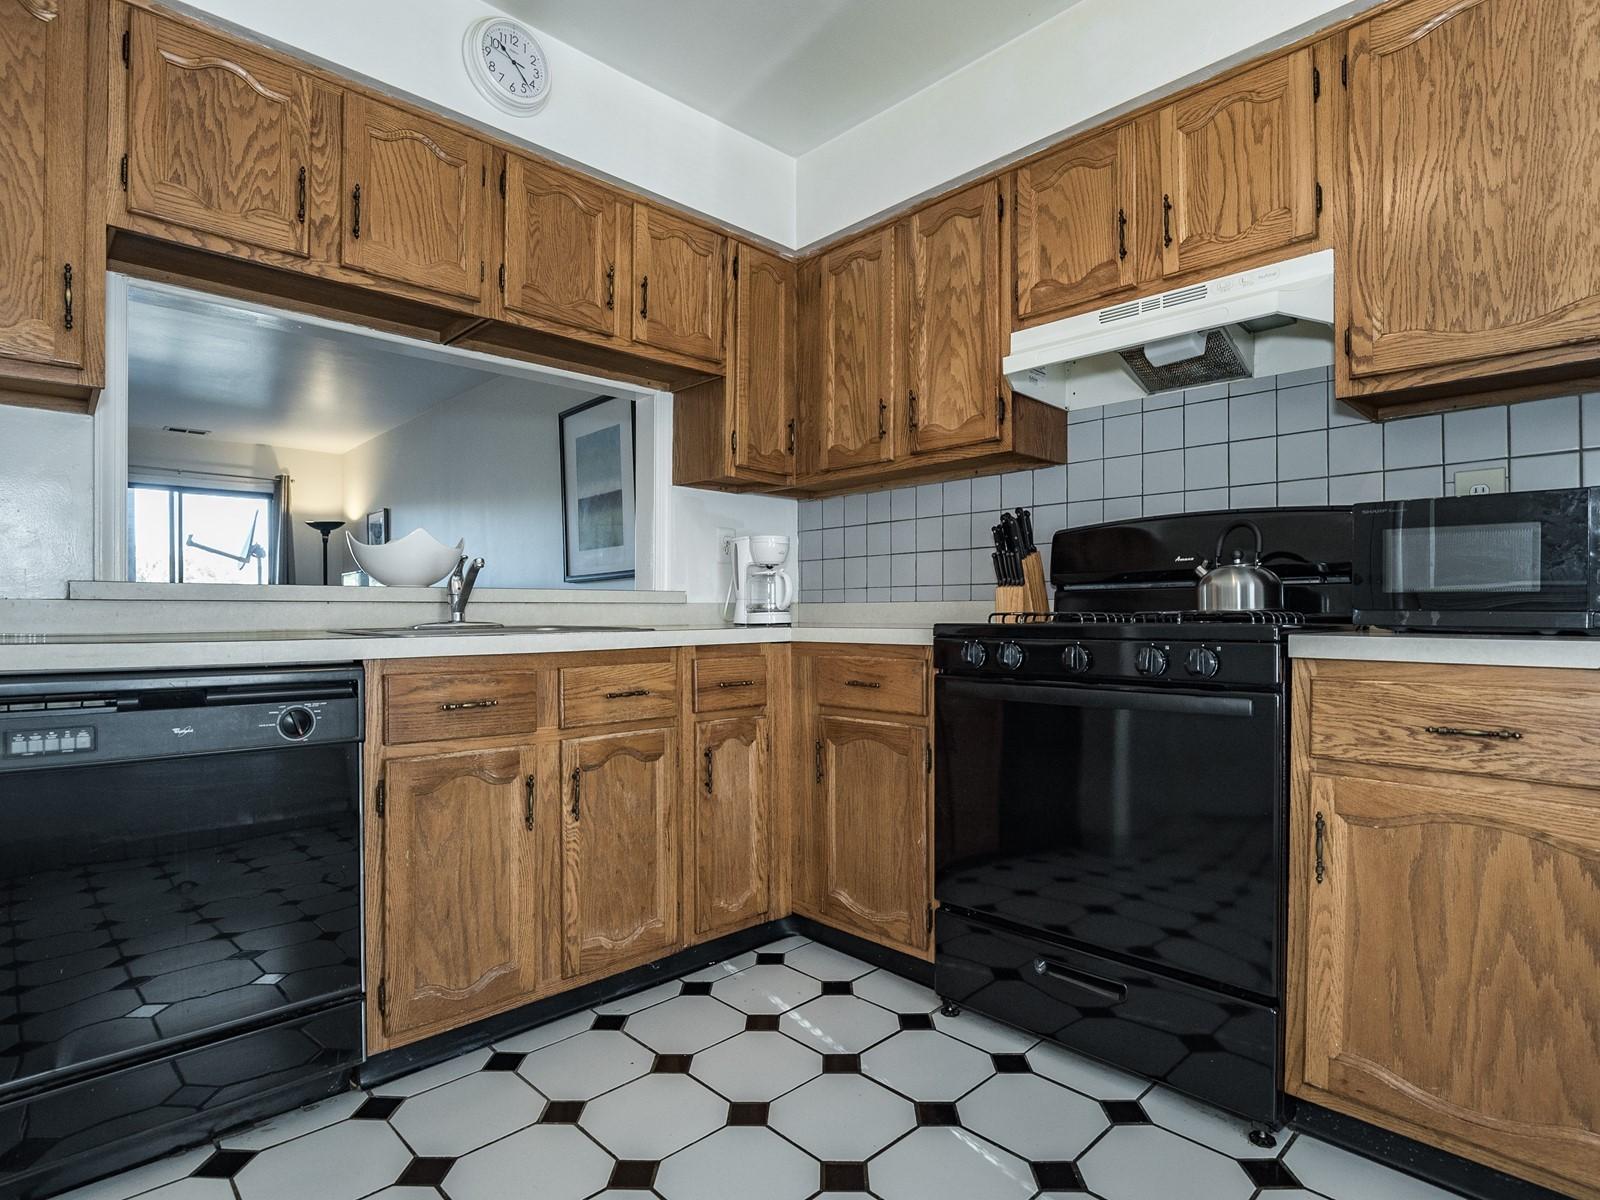 Woodbridge 404 Furnished Apartment Kitchen